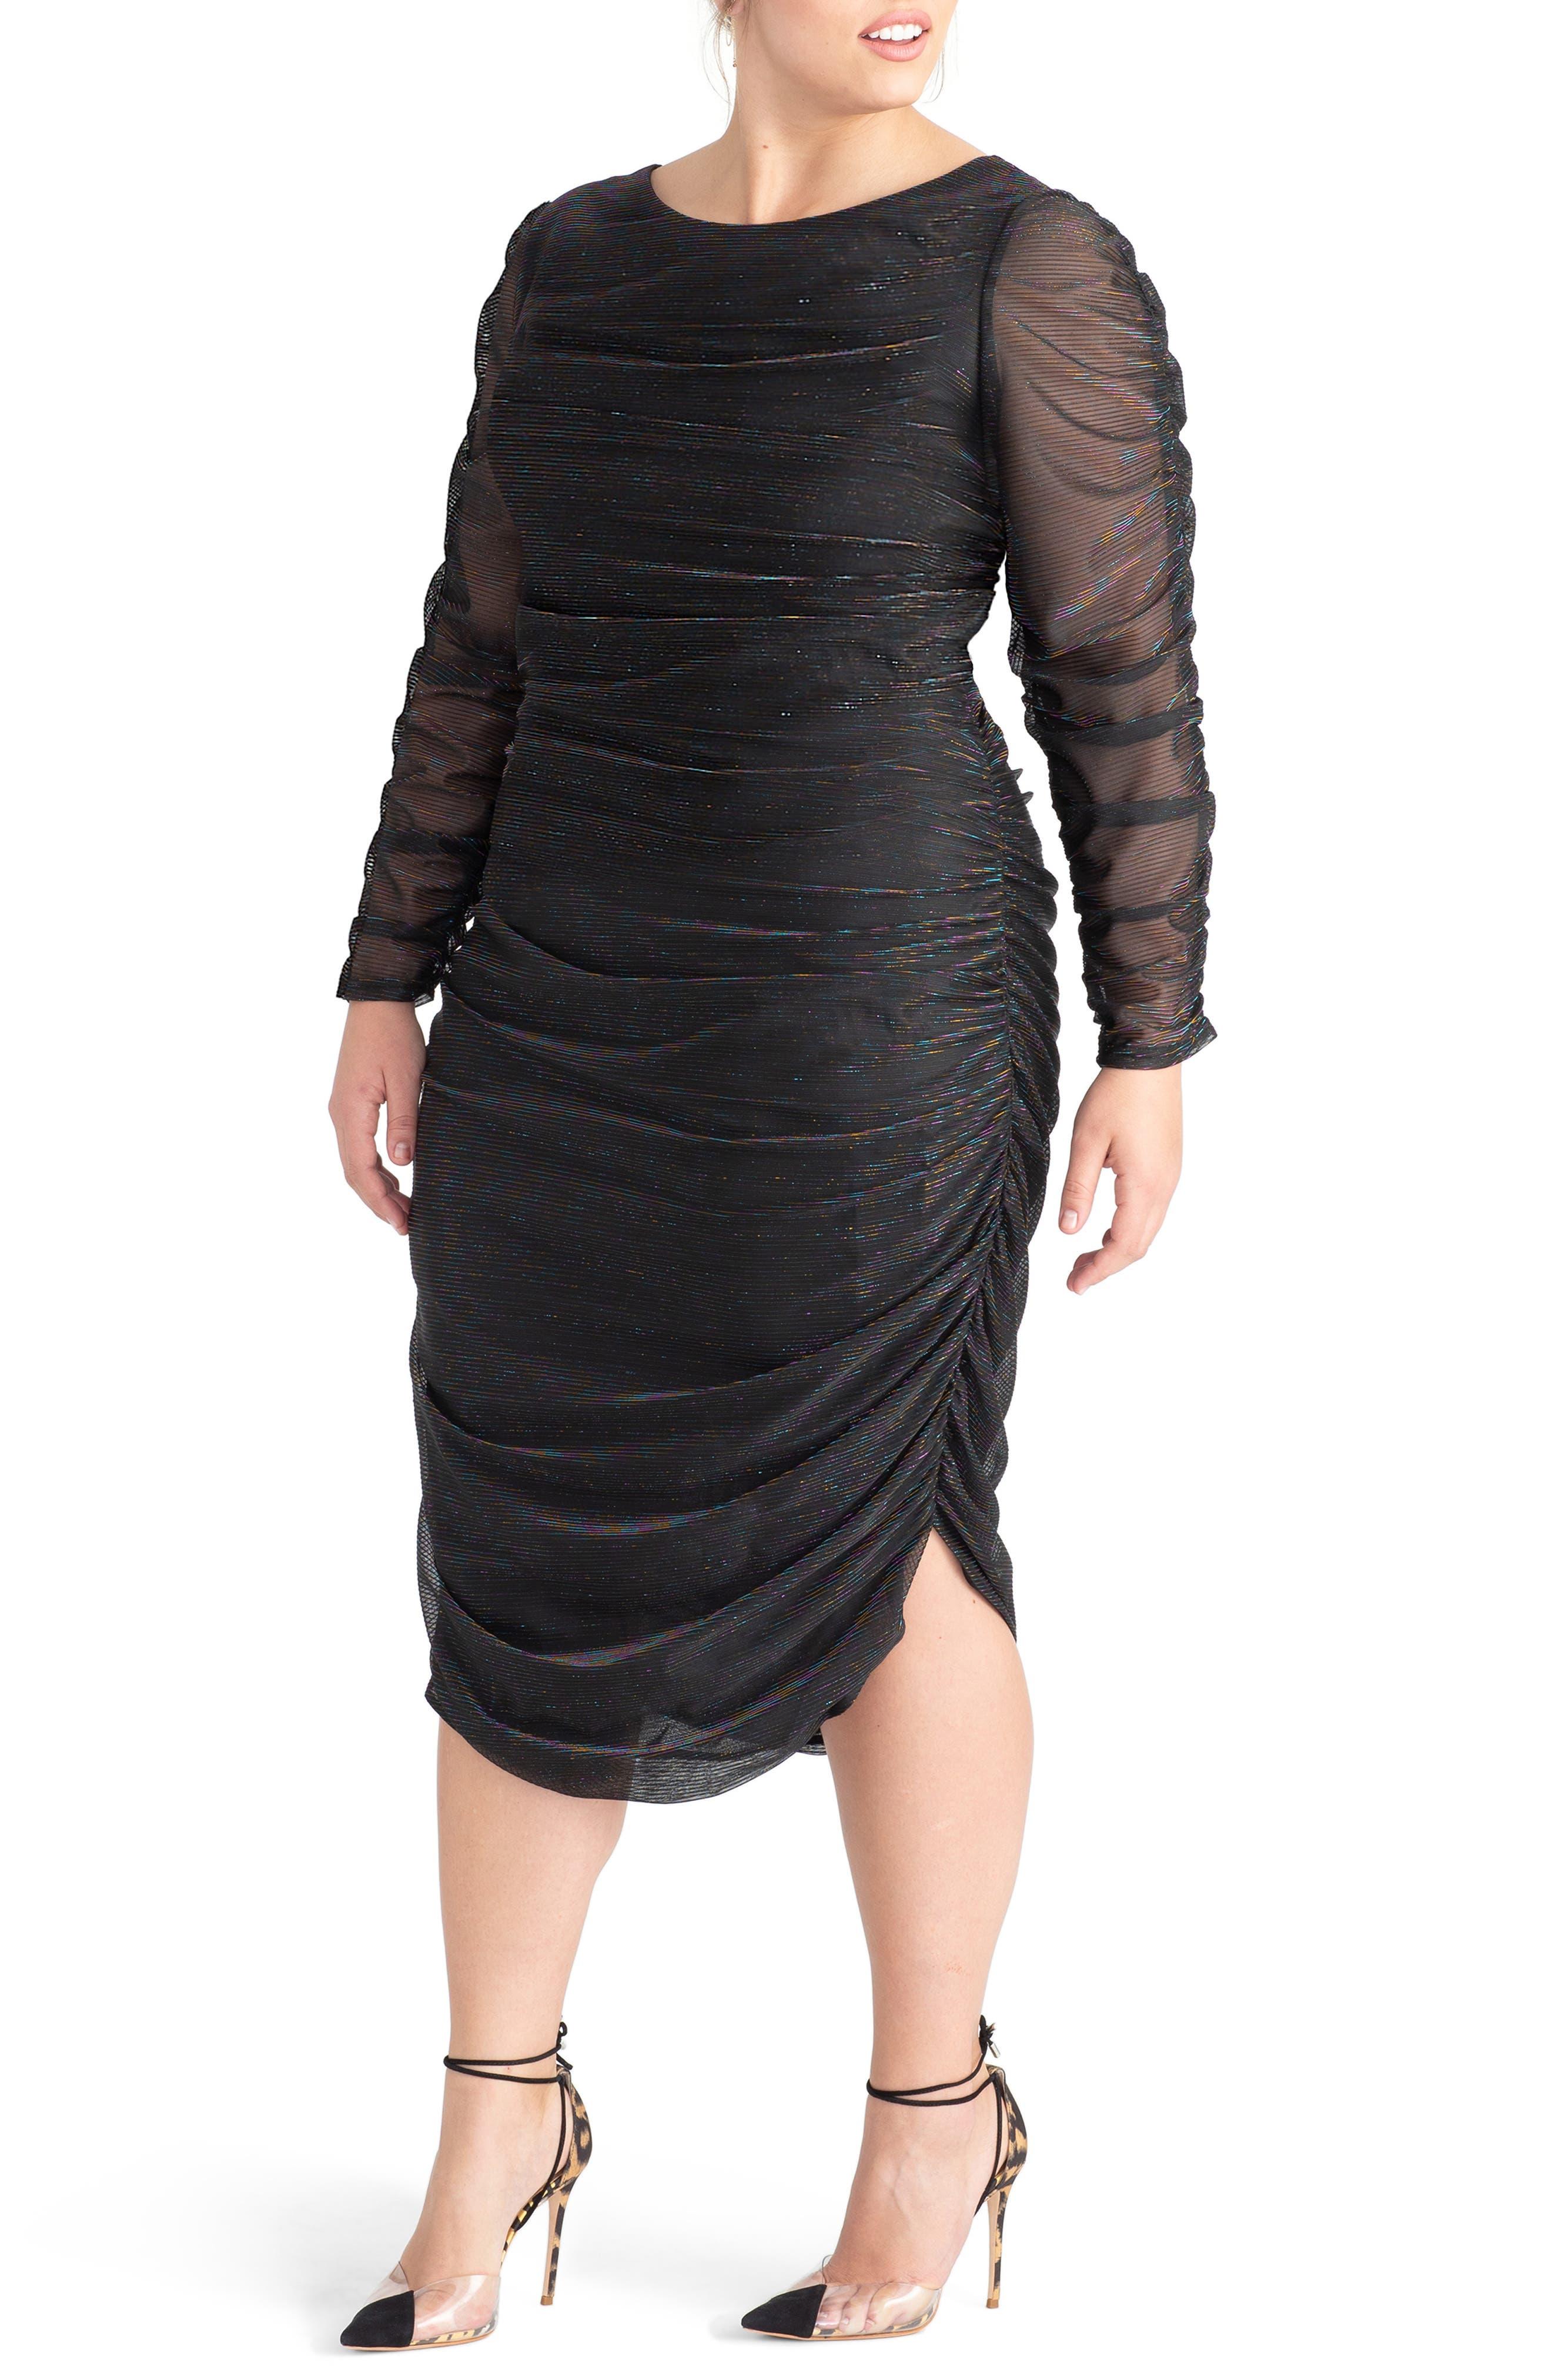 Plus Size Rachel Rachel Roy Metallic Pinstripe Ruched Dress, Black